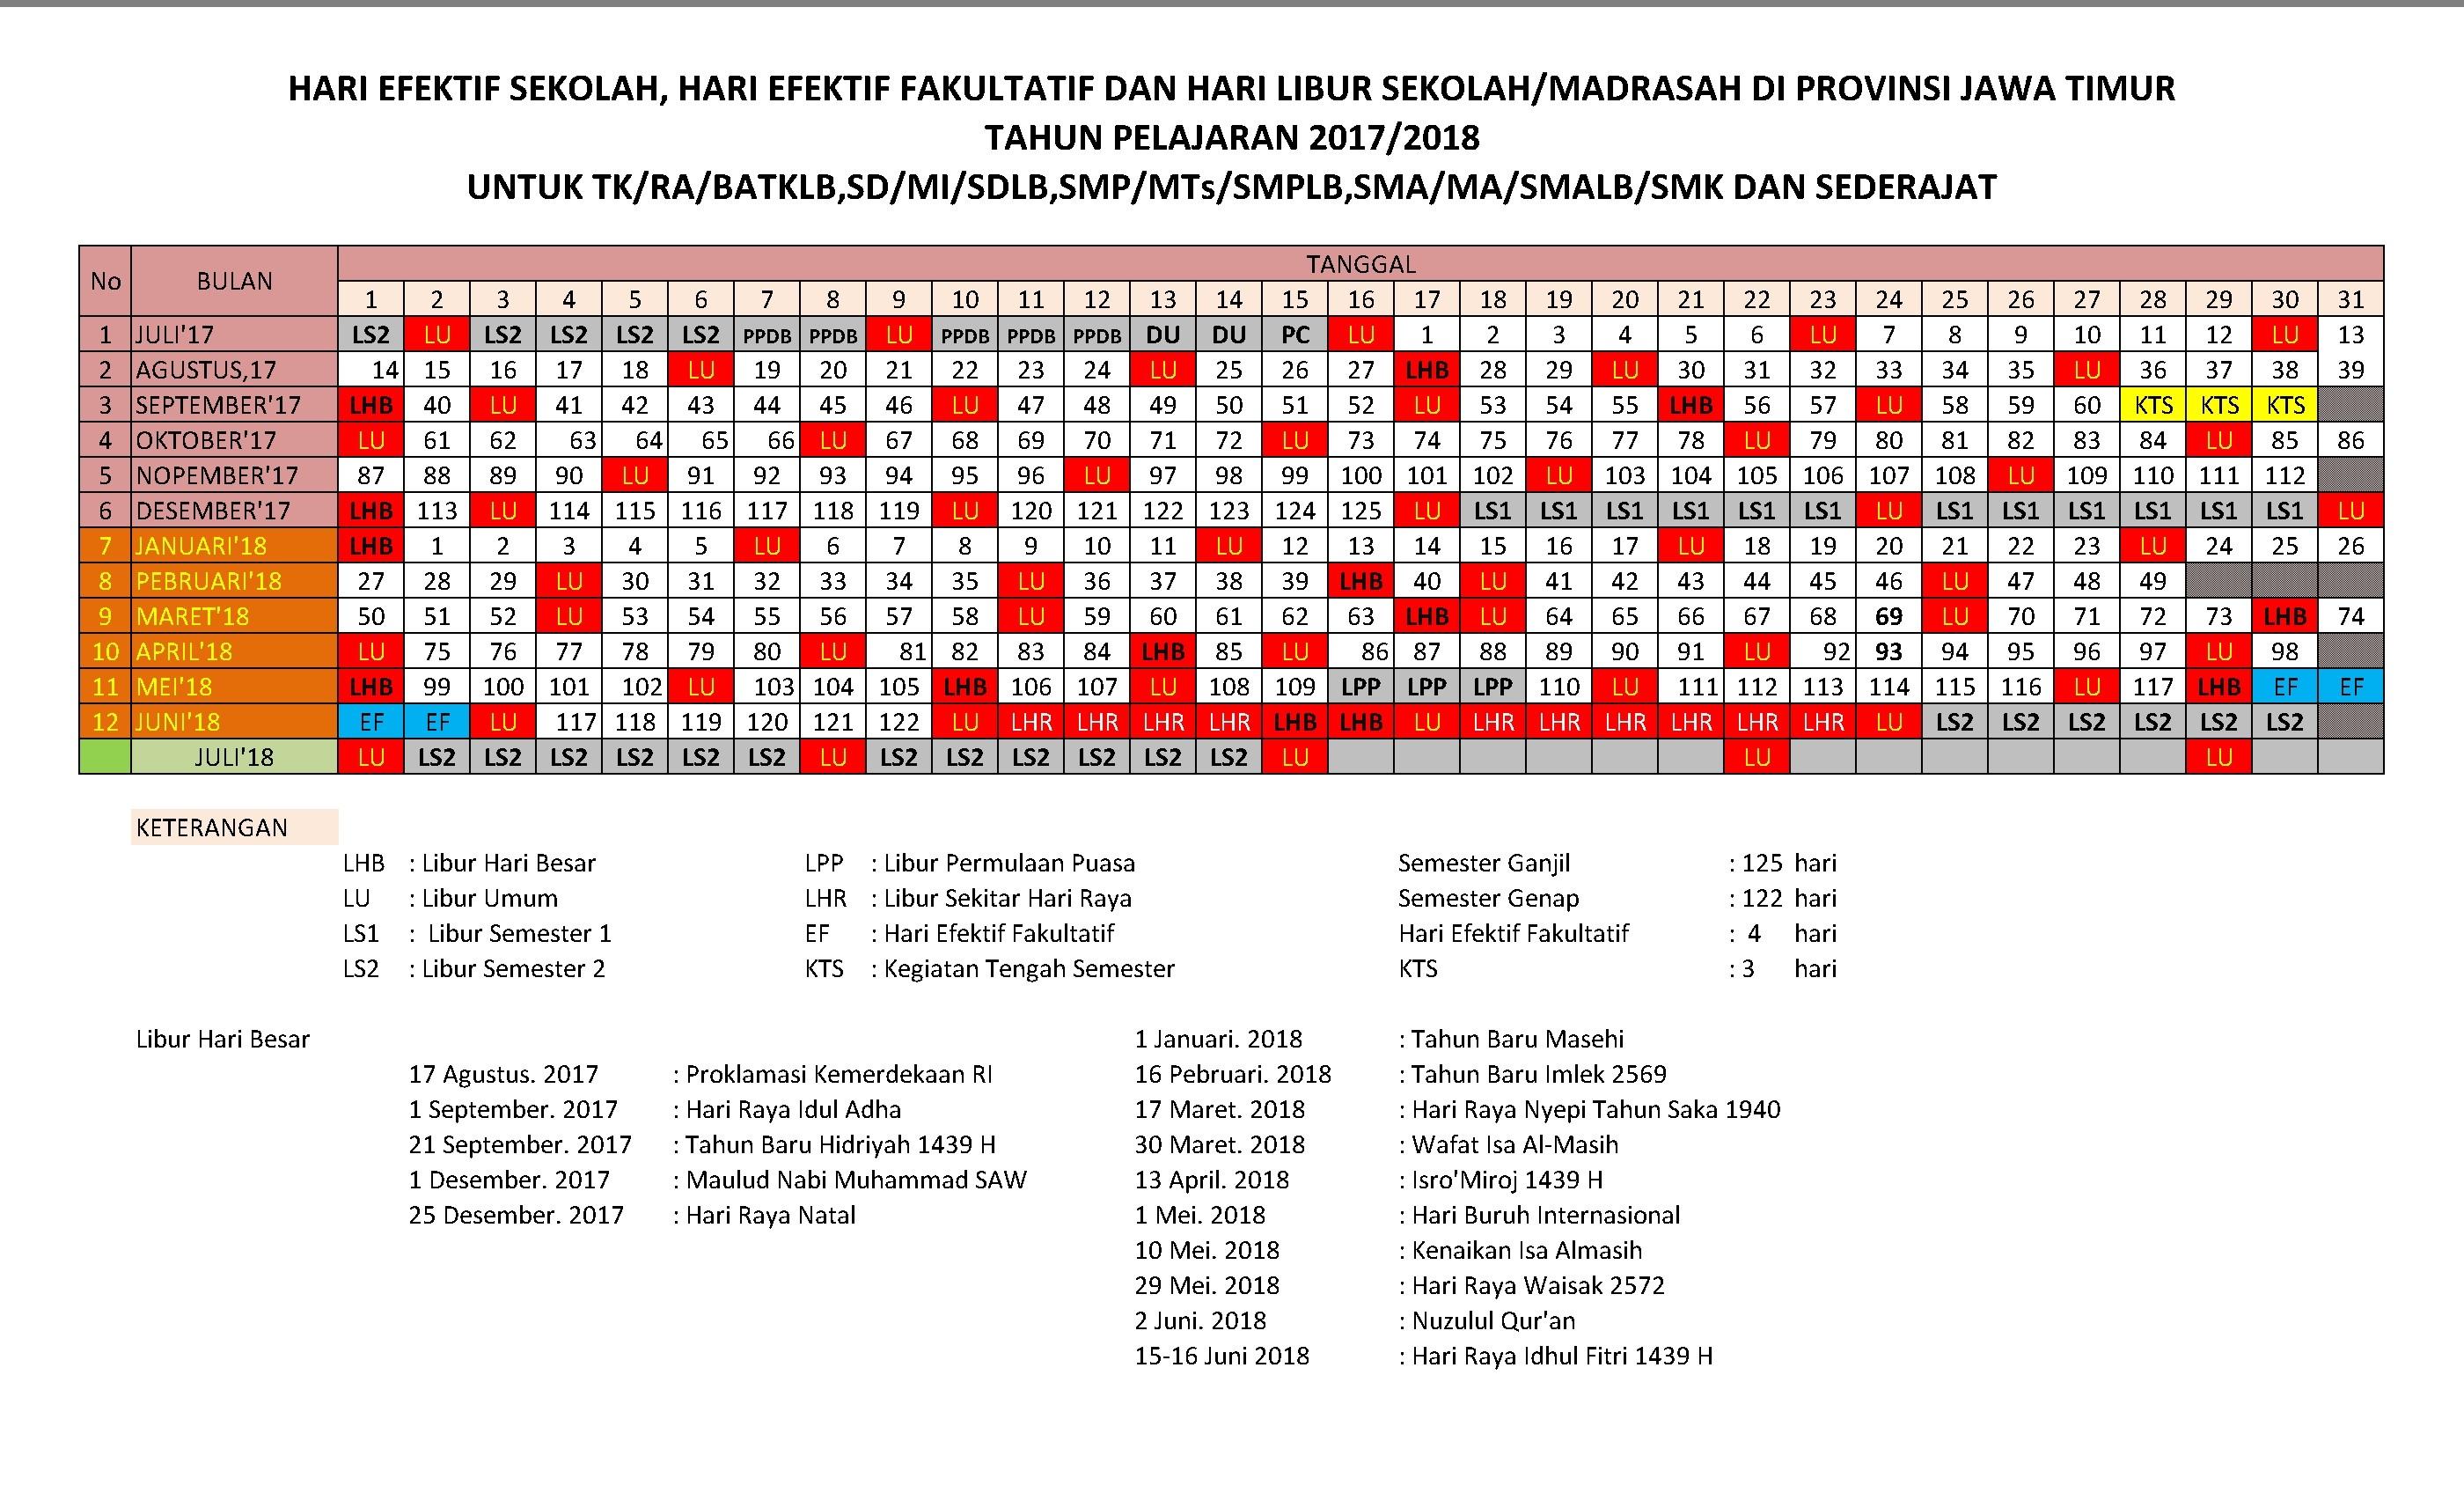 Kalender Pendidikan 2017-2018 Provinsi Jawa Timur